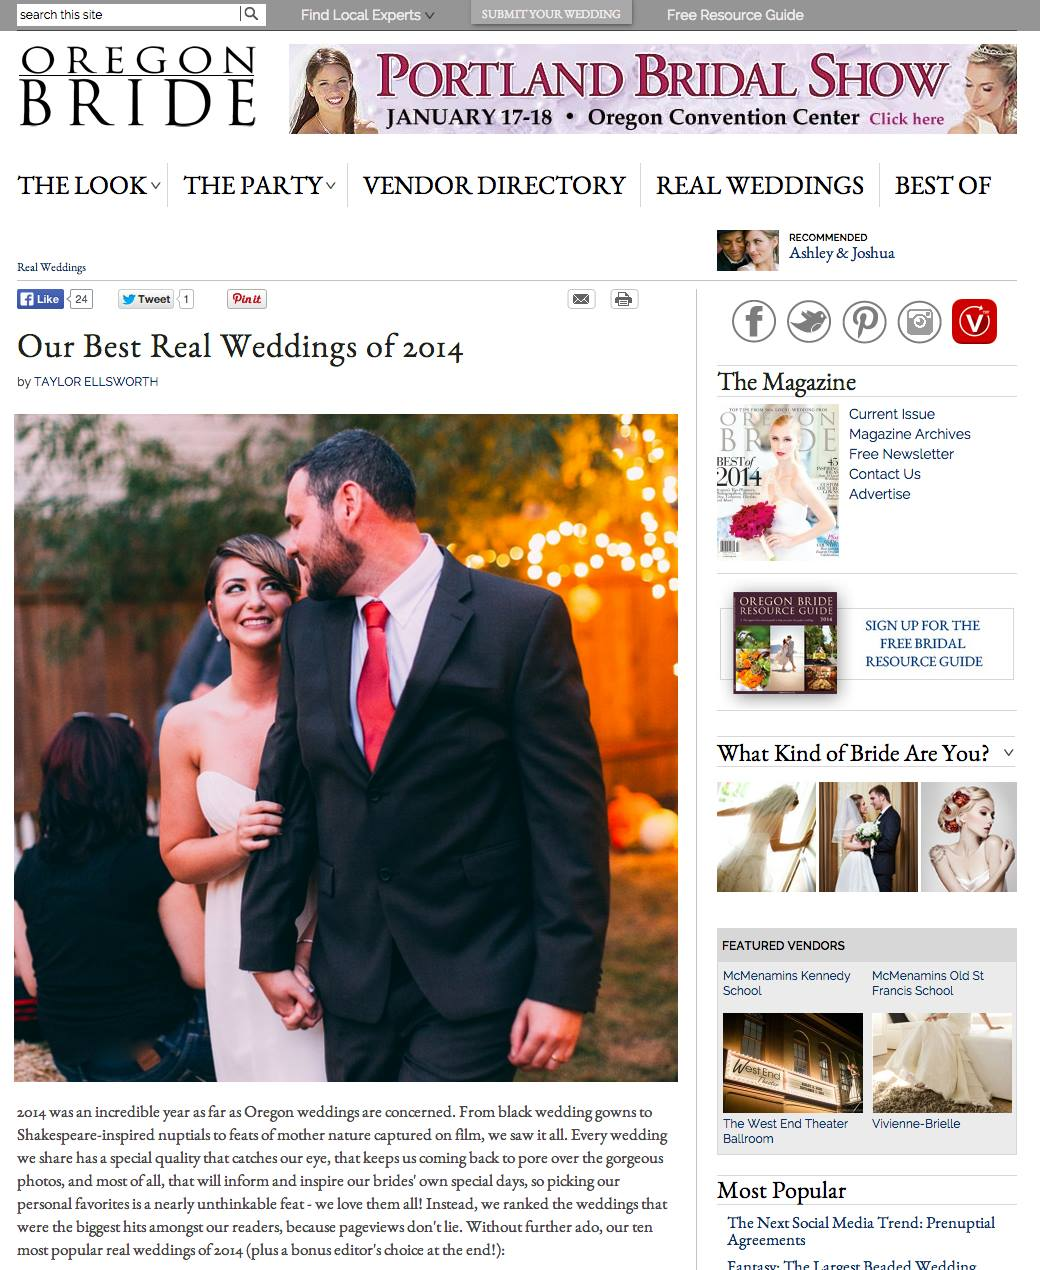 Leah Flores 'Best Real Wedding' for Oregon Bride